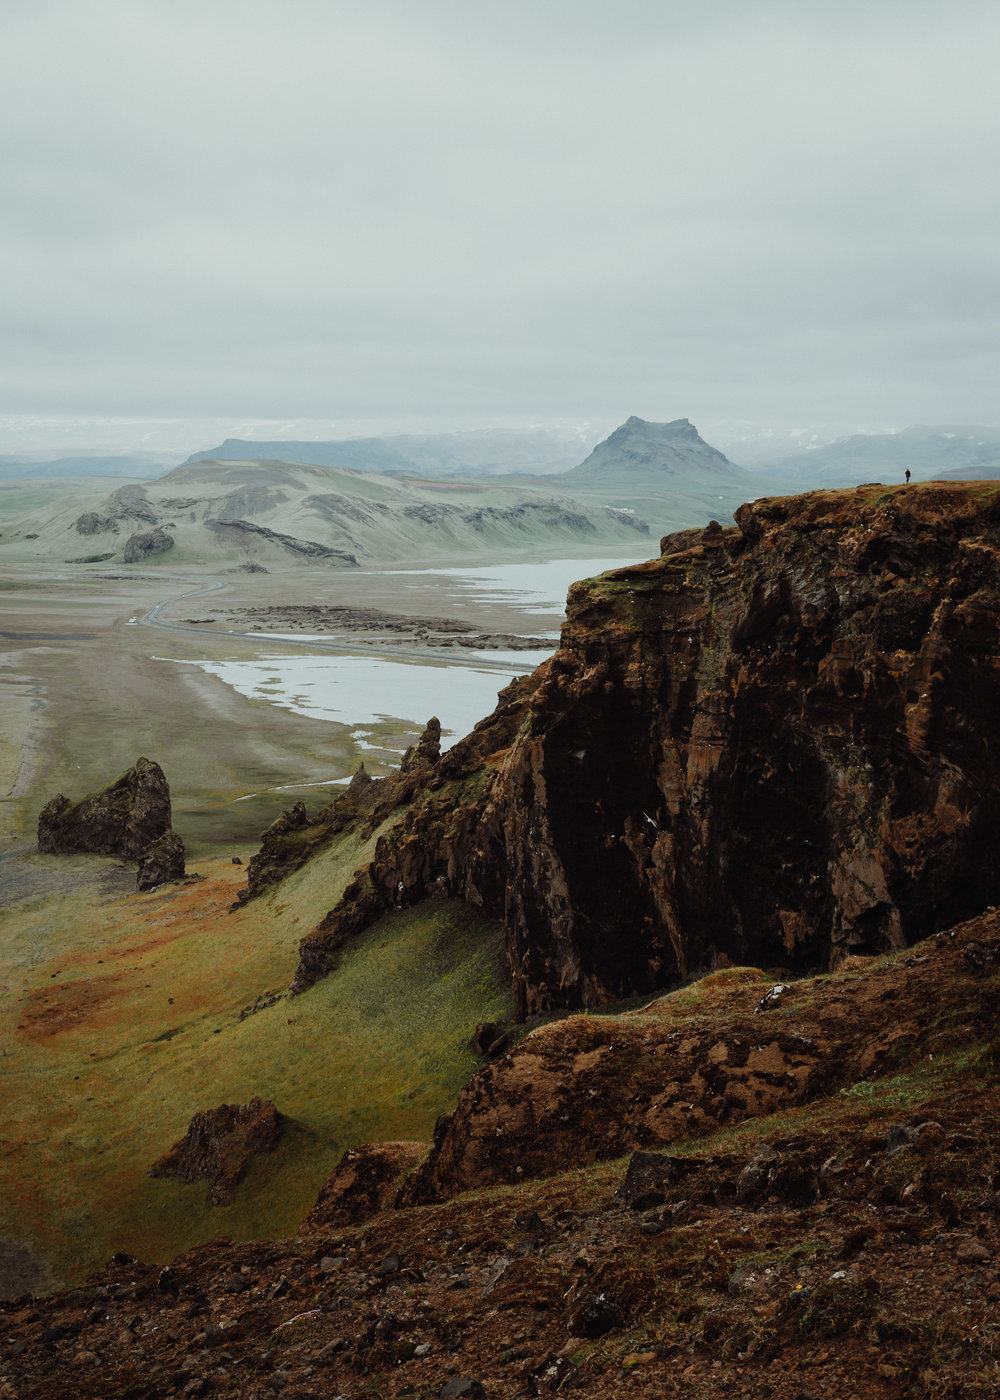 14-iceland-katla-volcano-hiking-anna-elina-lahti-photographer.jpg